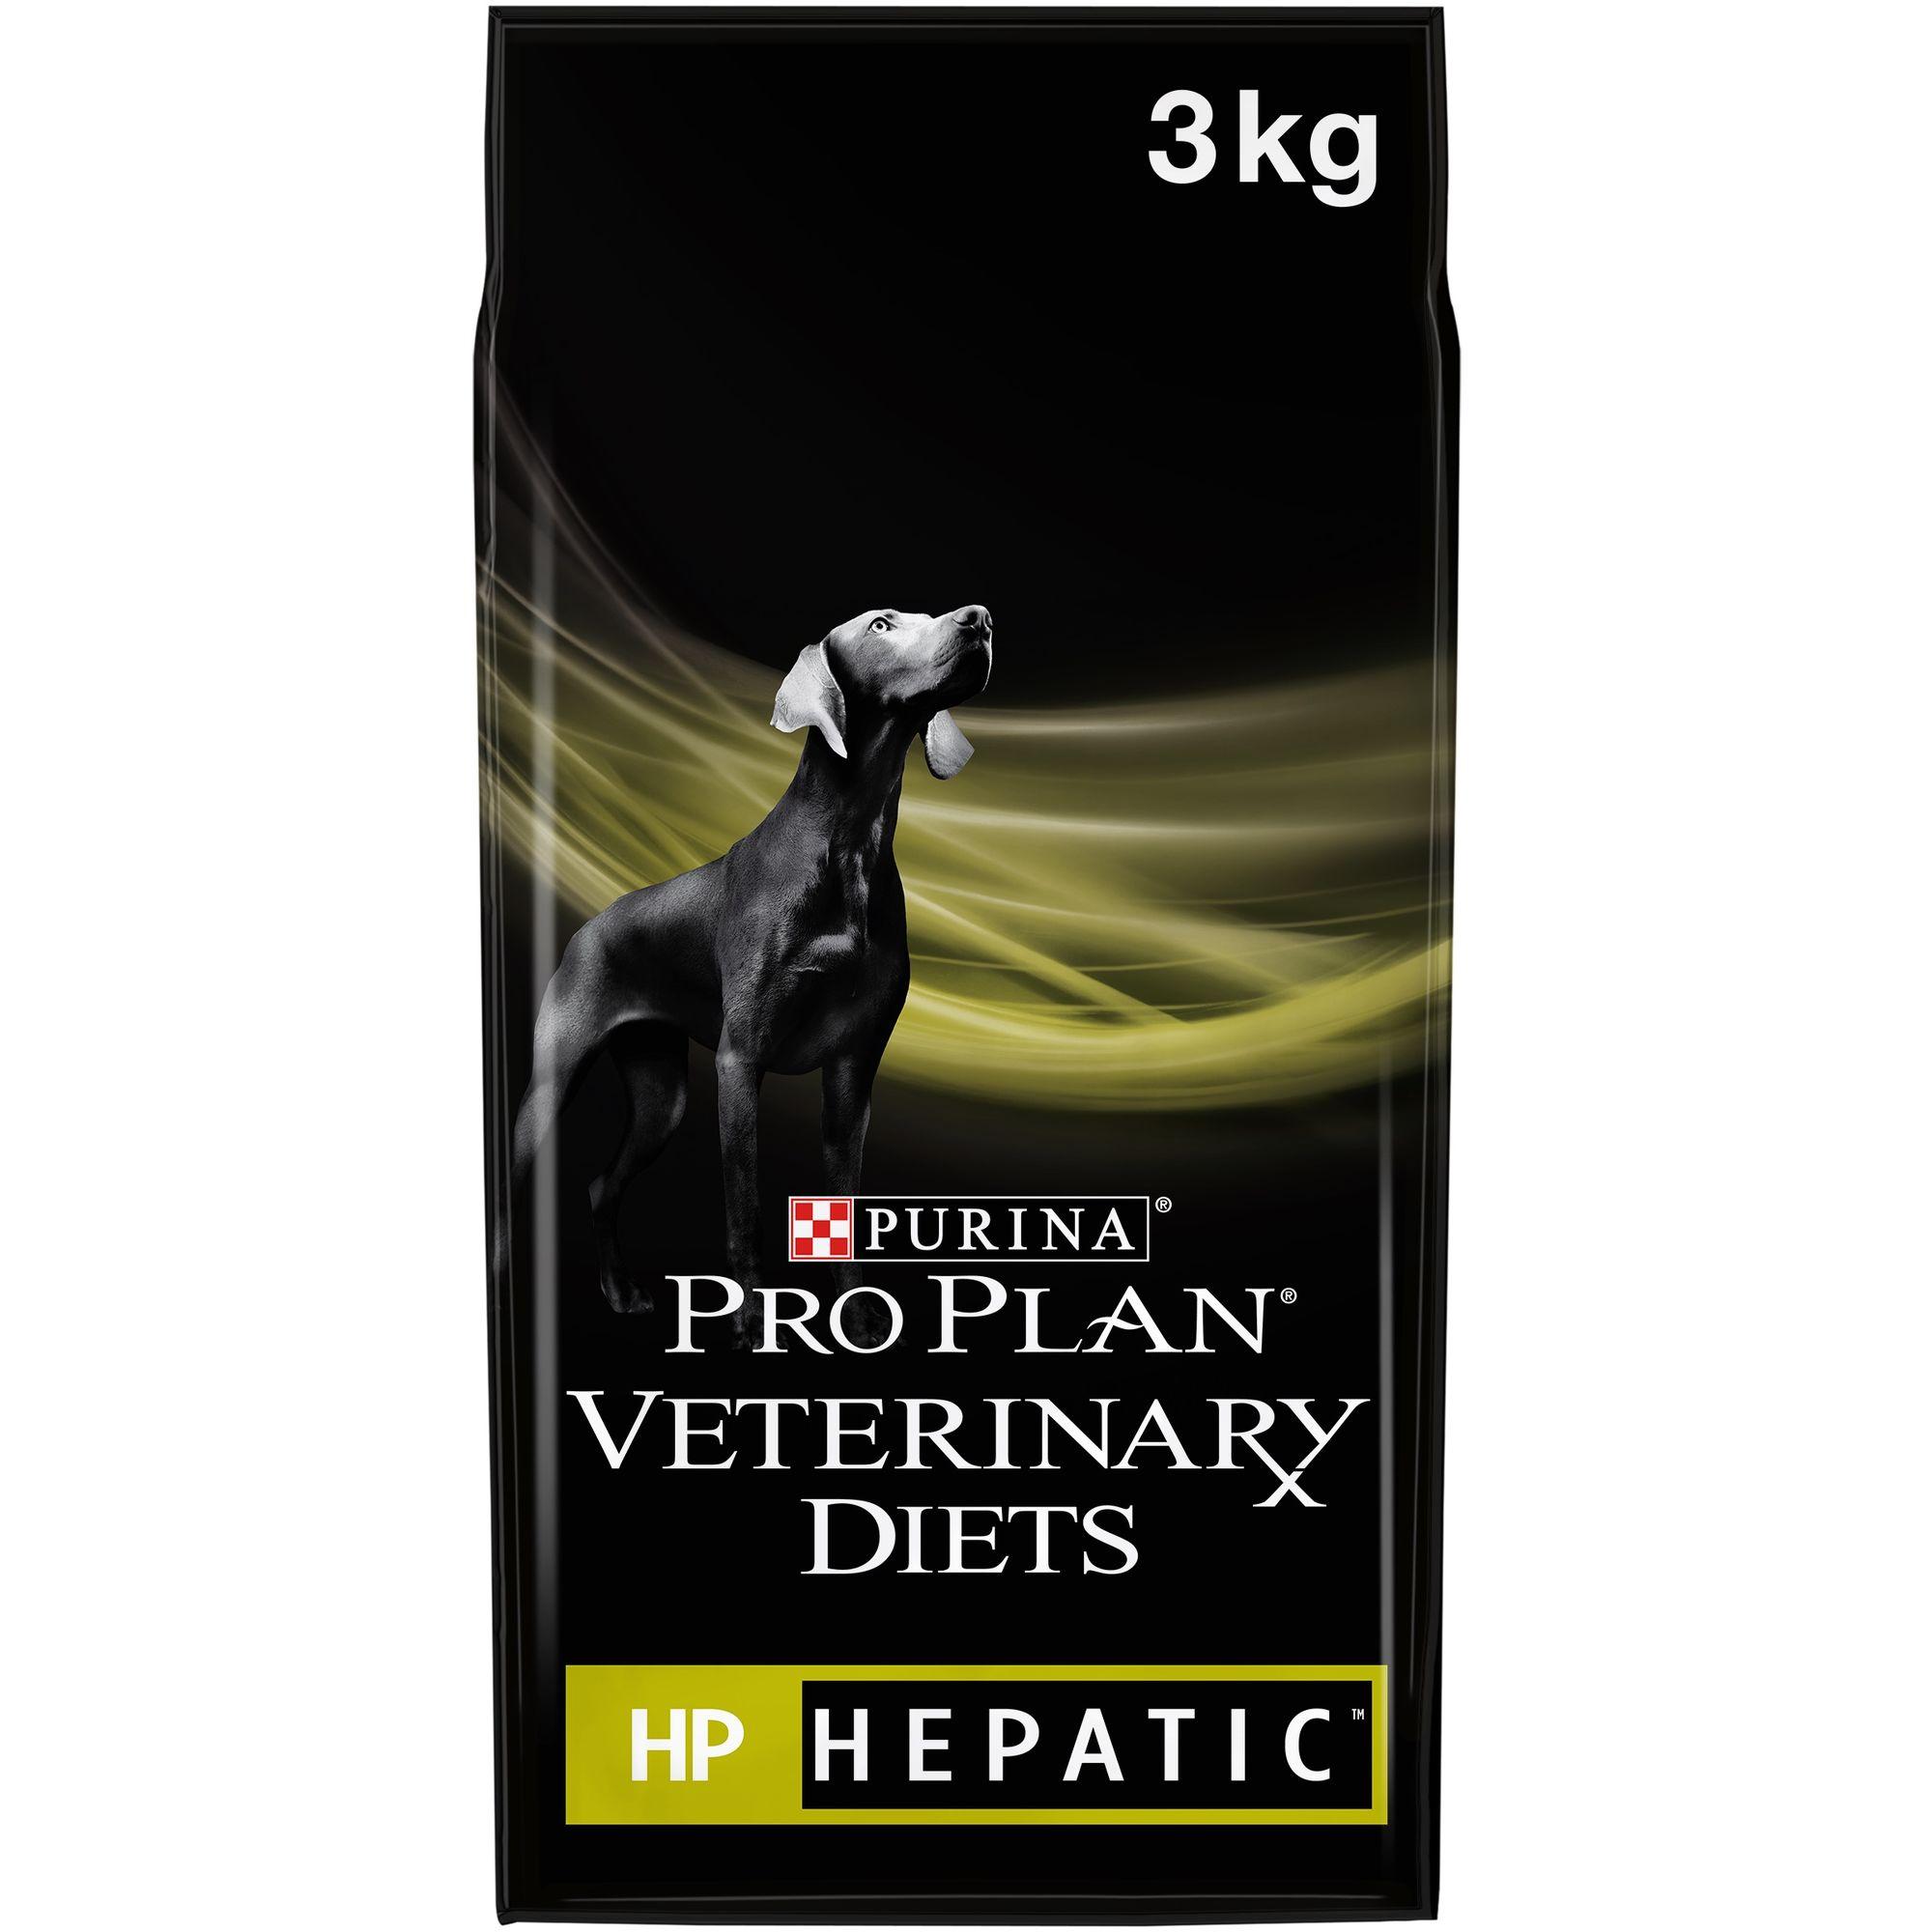 Purina Pro Plan Veterinary Diets Canine HP Hepatic Hondenvoer 3 kg